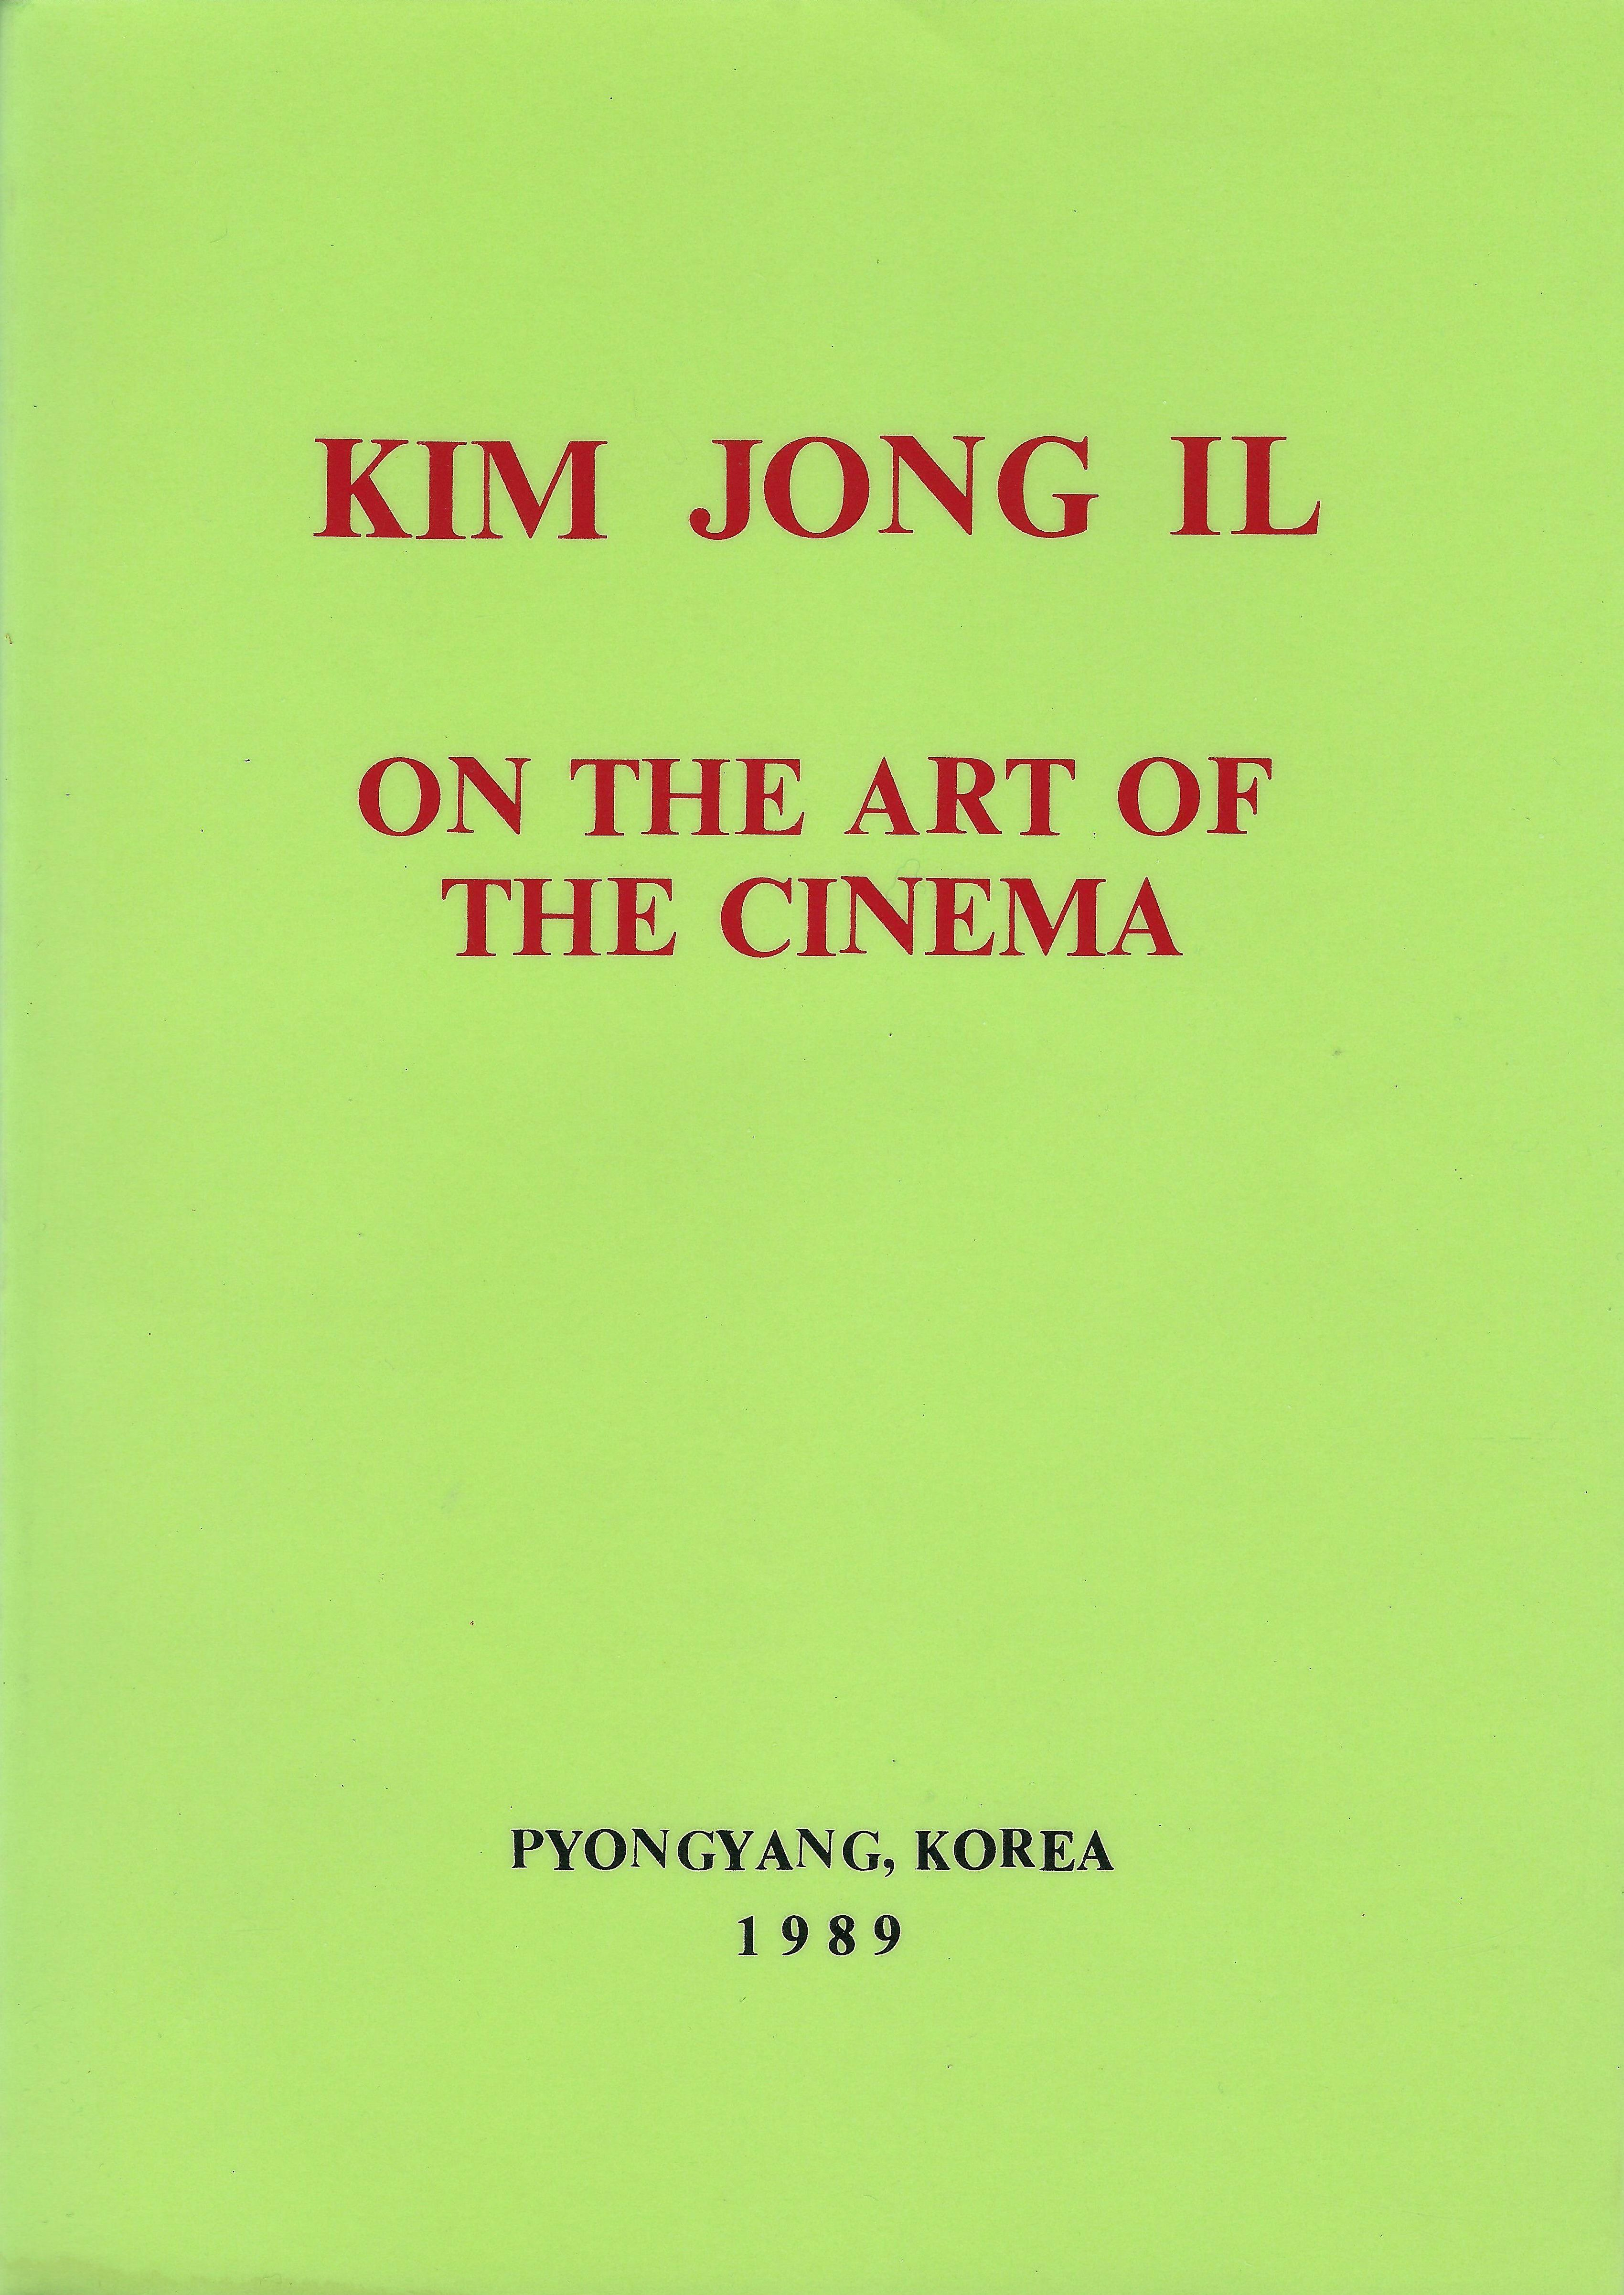 On The Art Of The Cinema Wikipedia